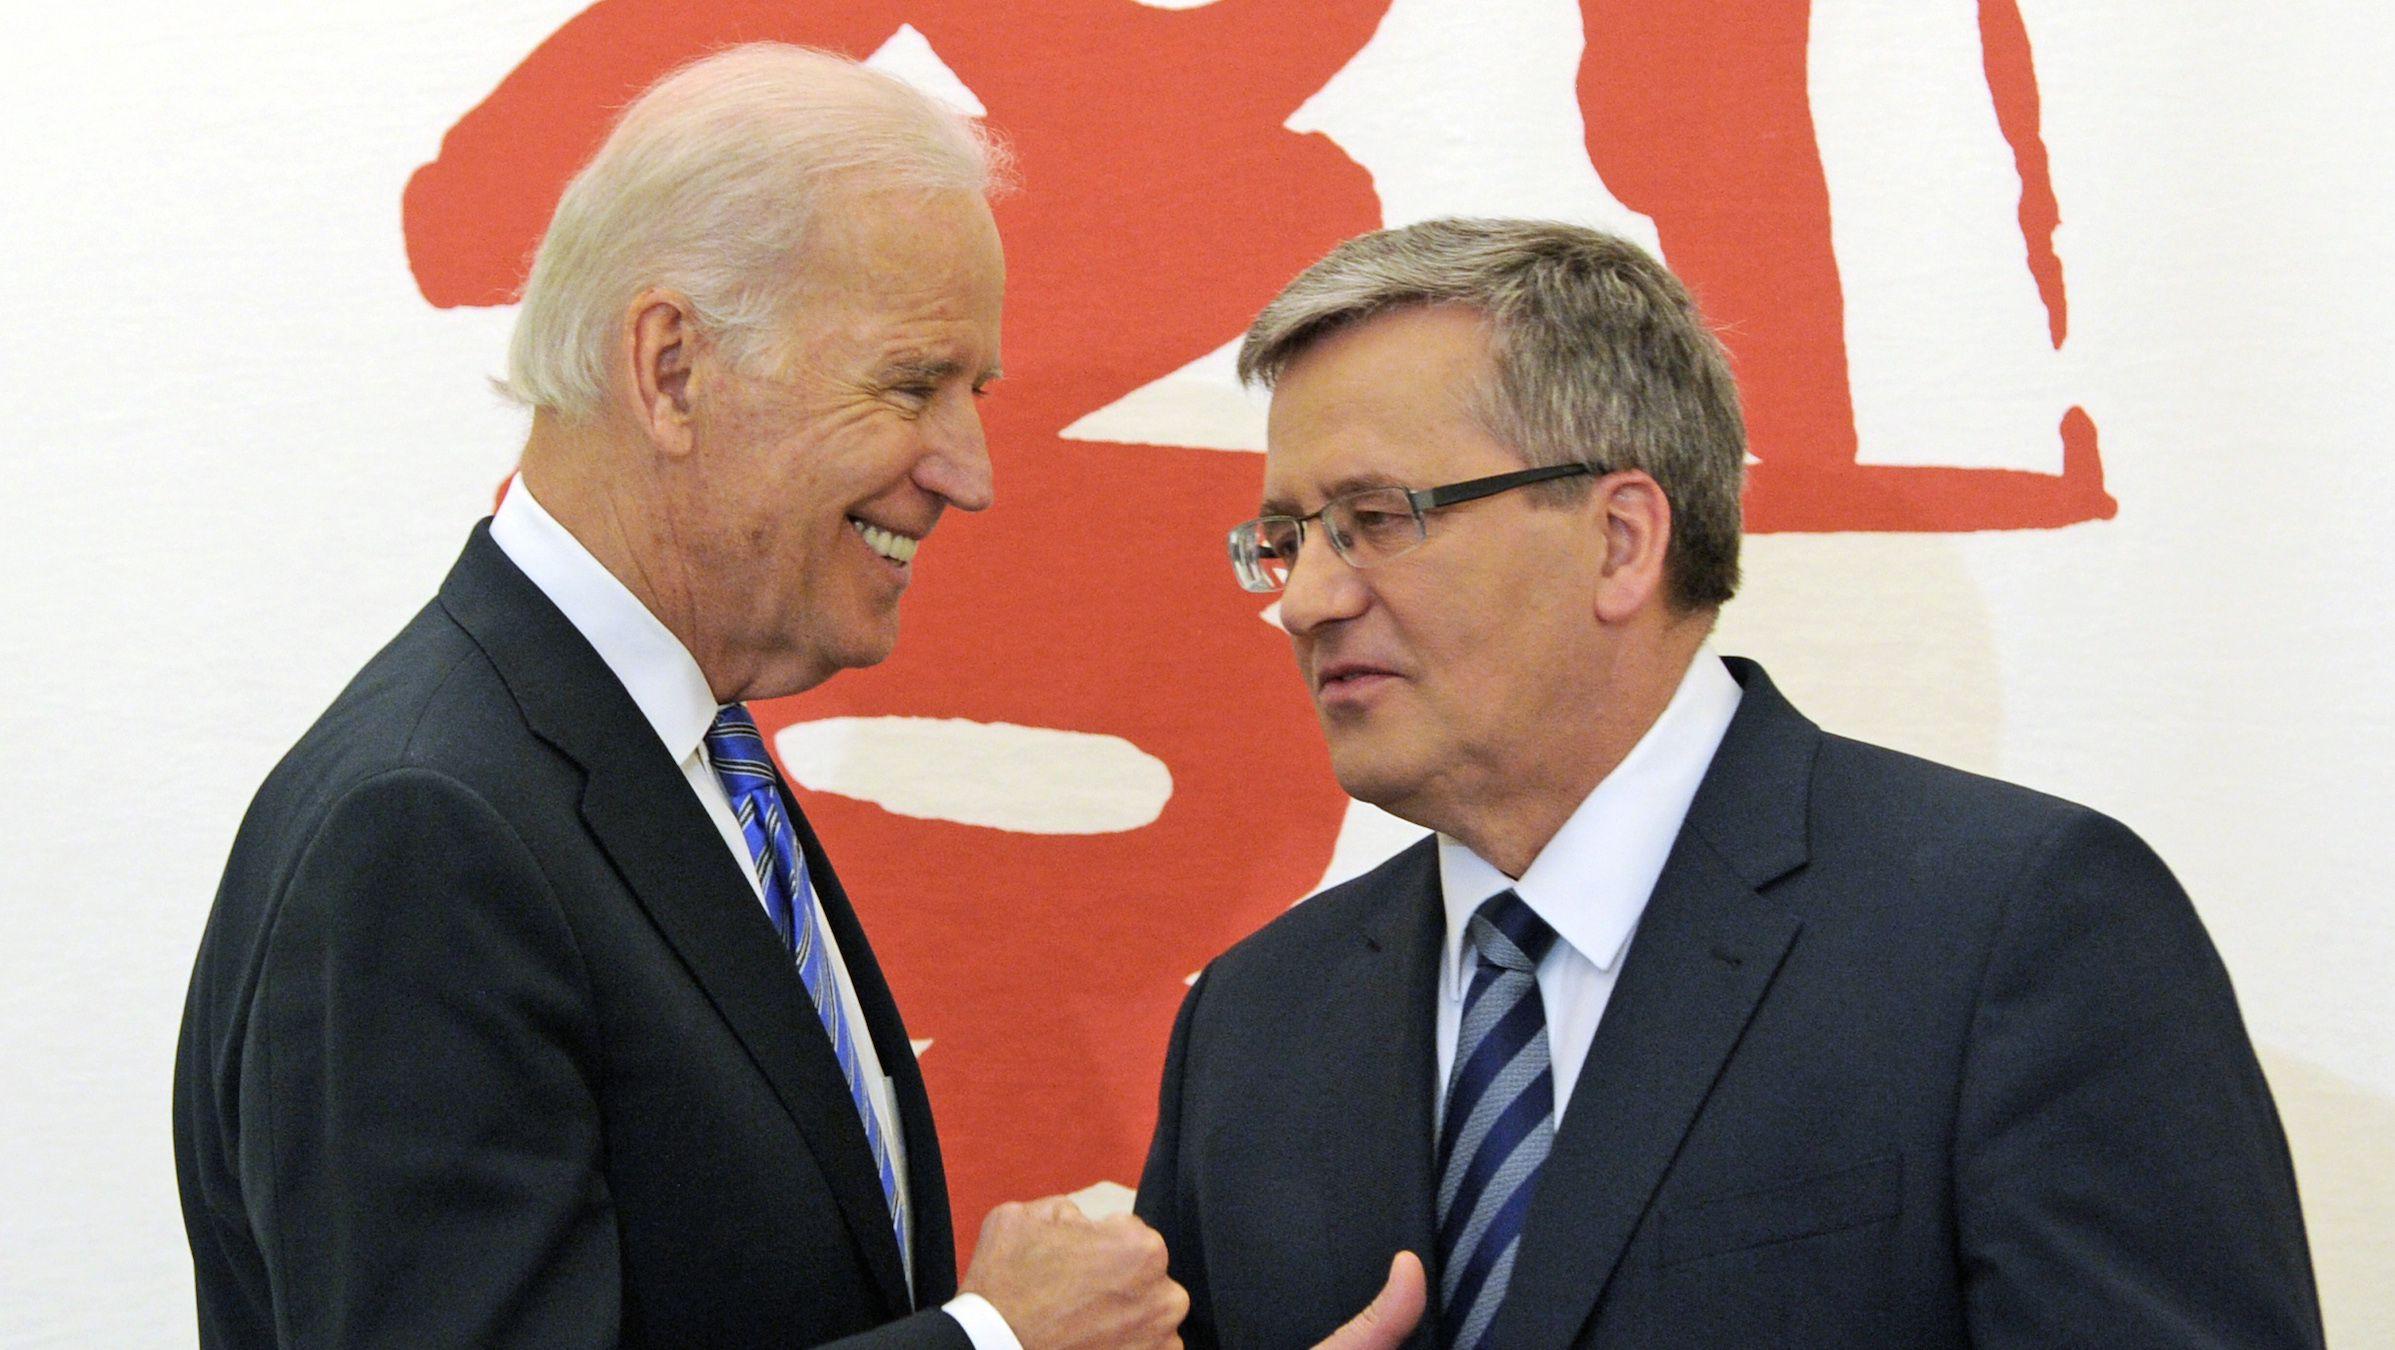 Joe Biden, Polish president Bronislaw Komorowski